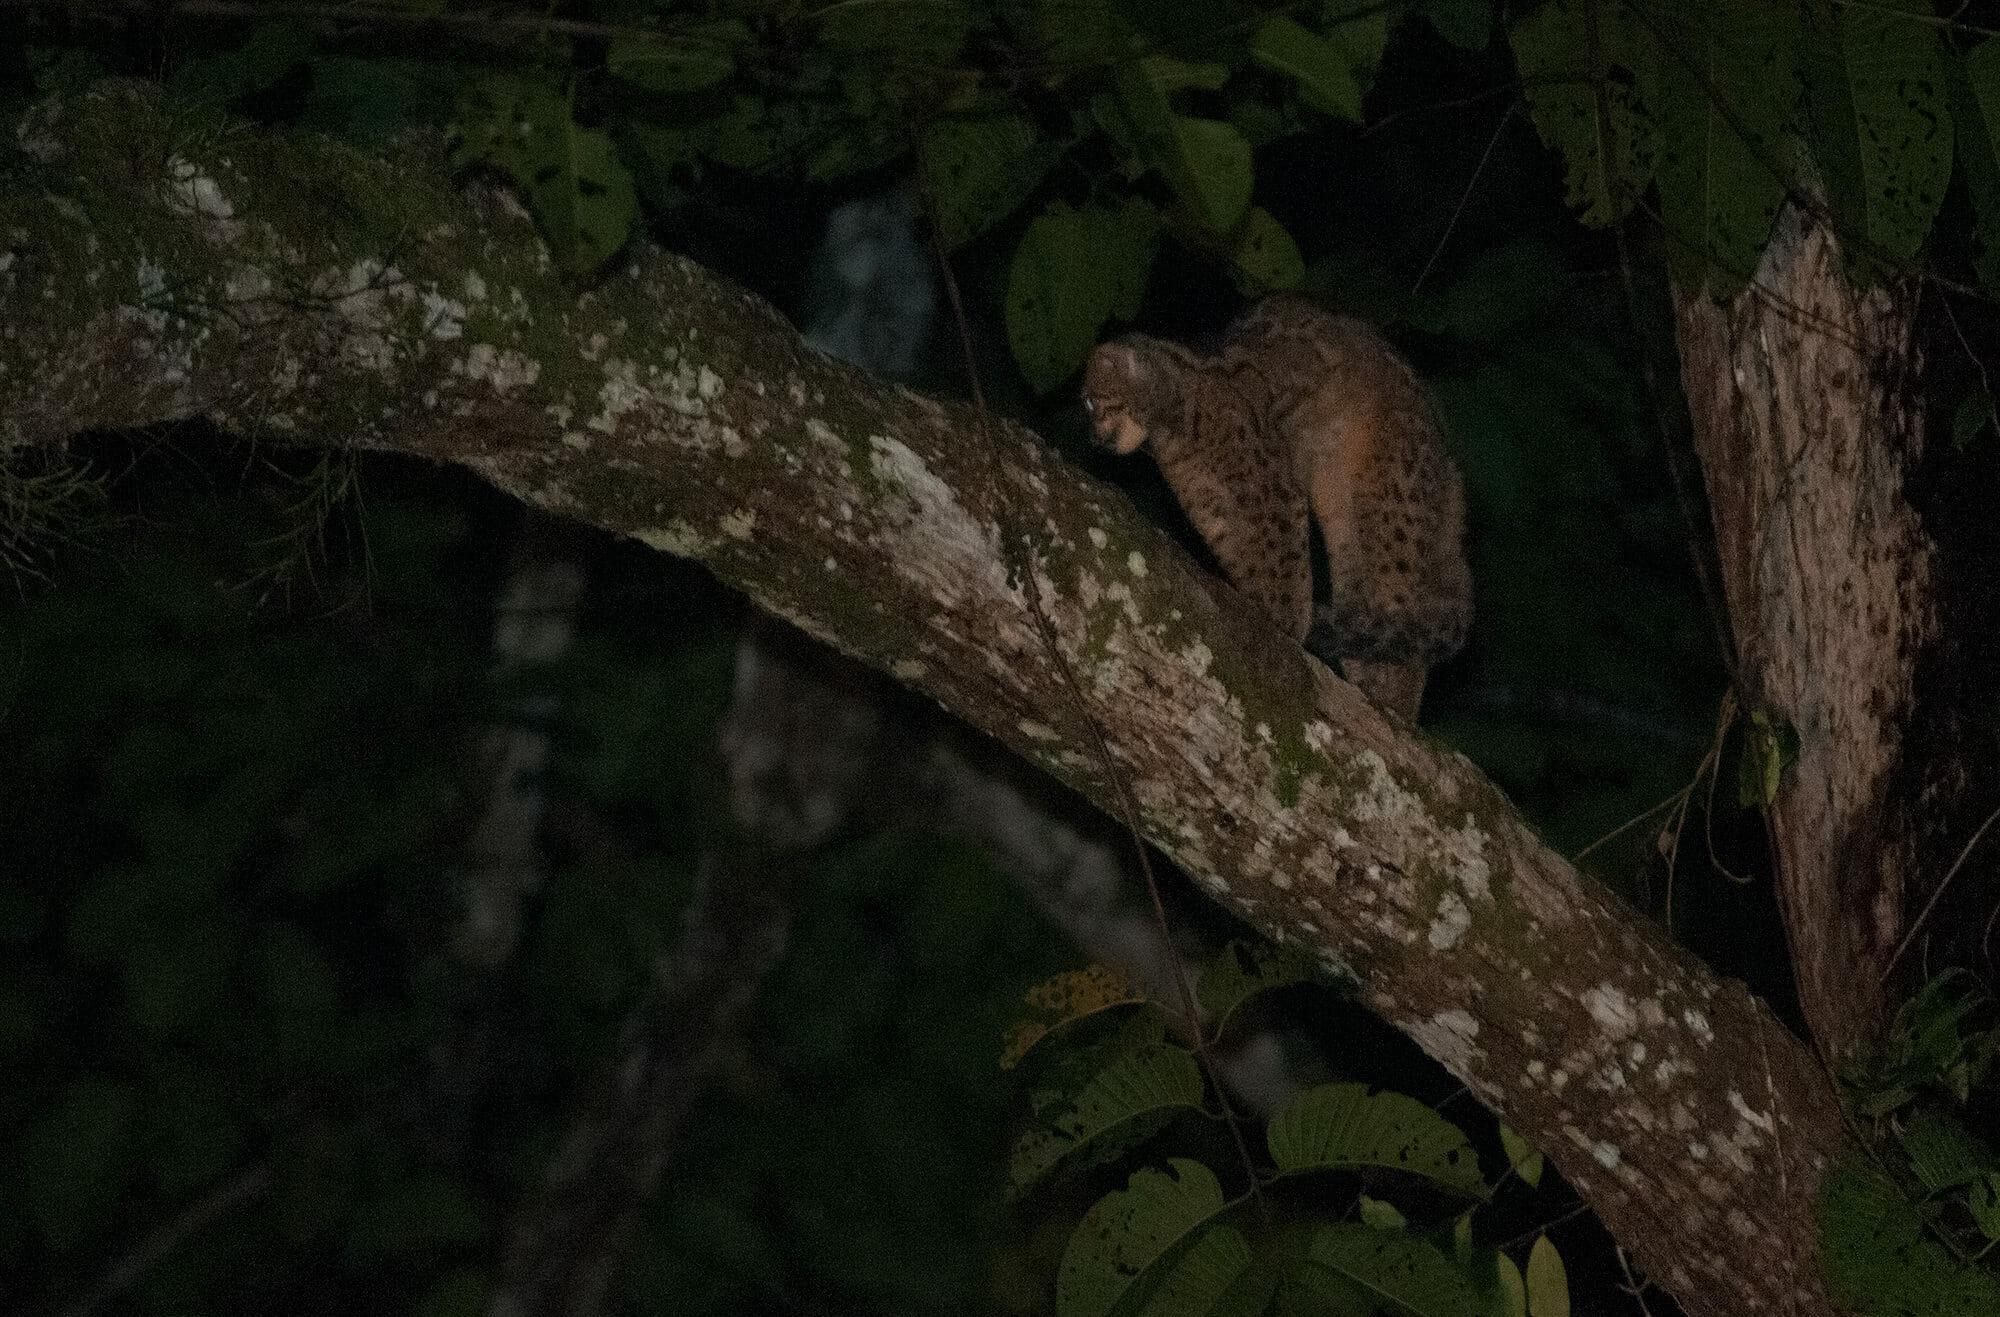 Marbled cat in Deramakot Forest Reserve, Borneo